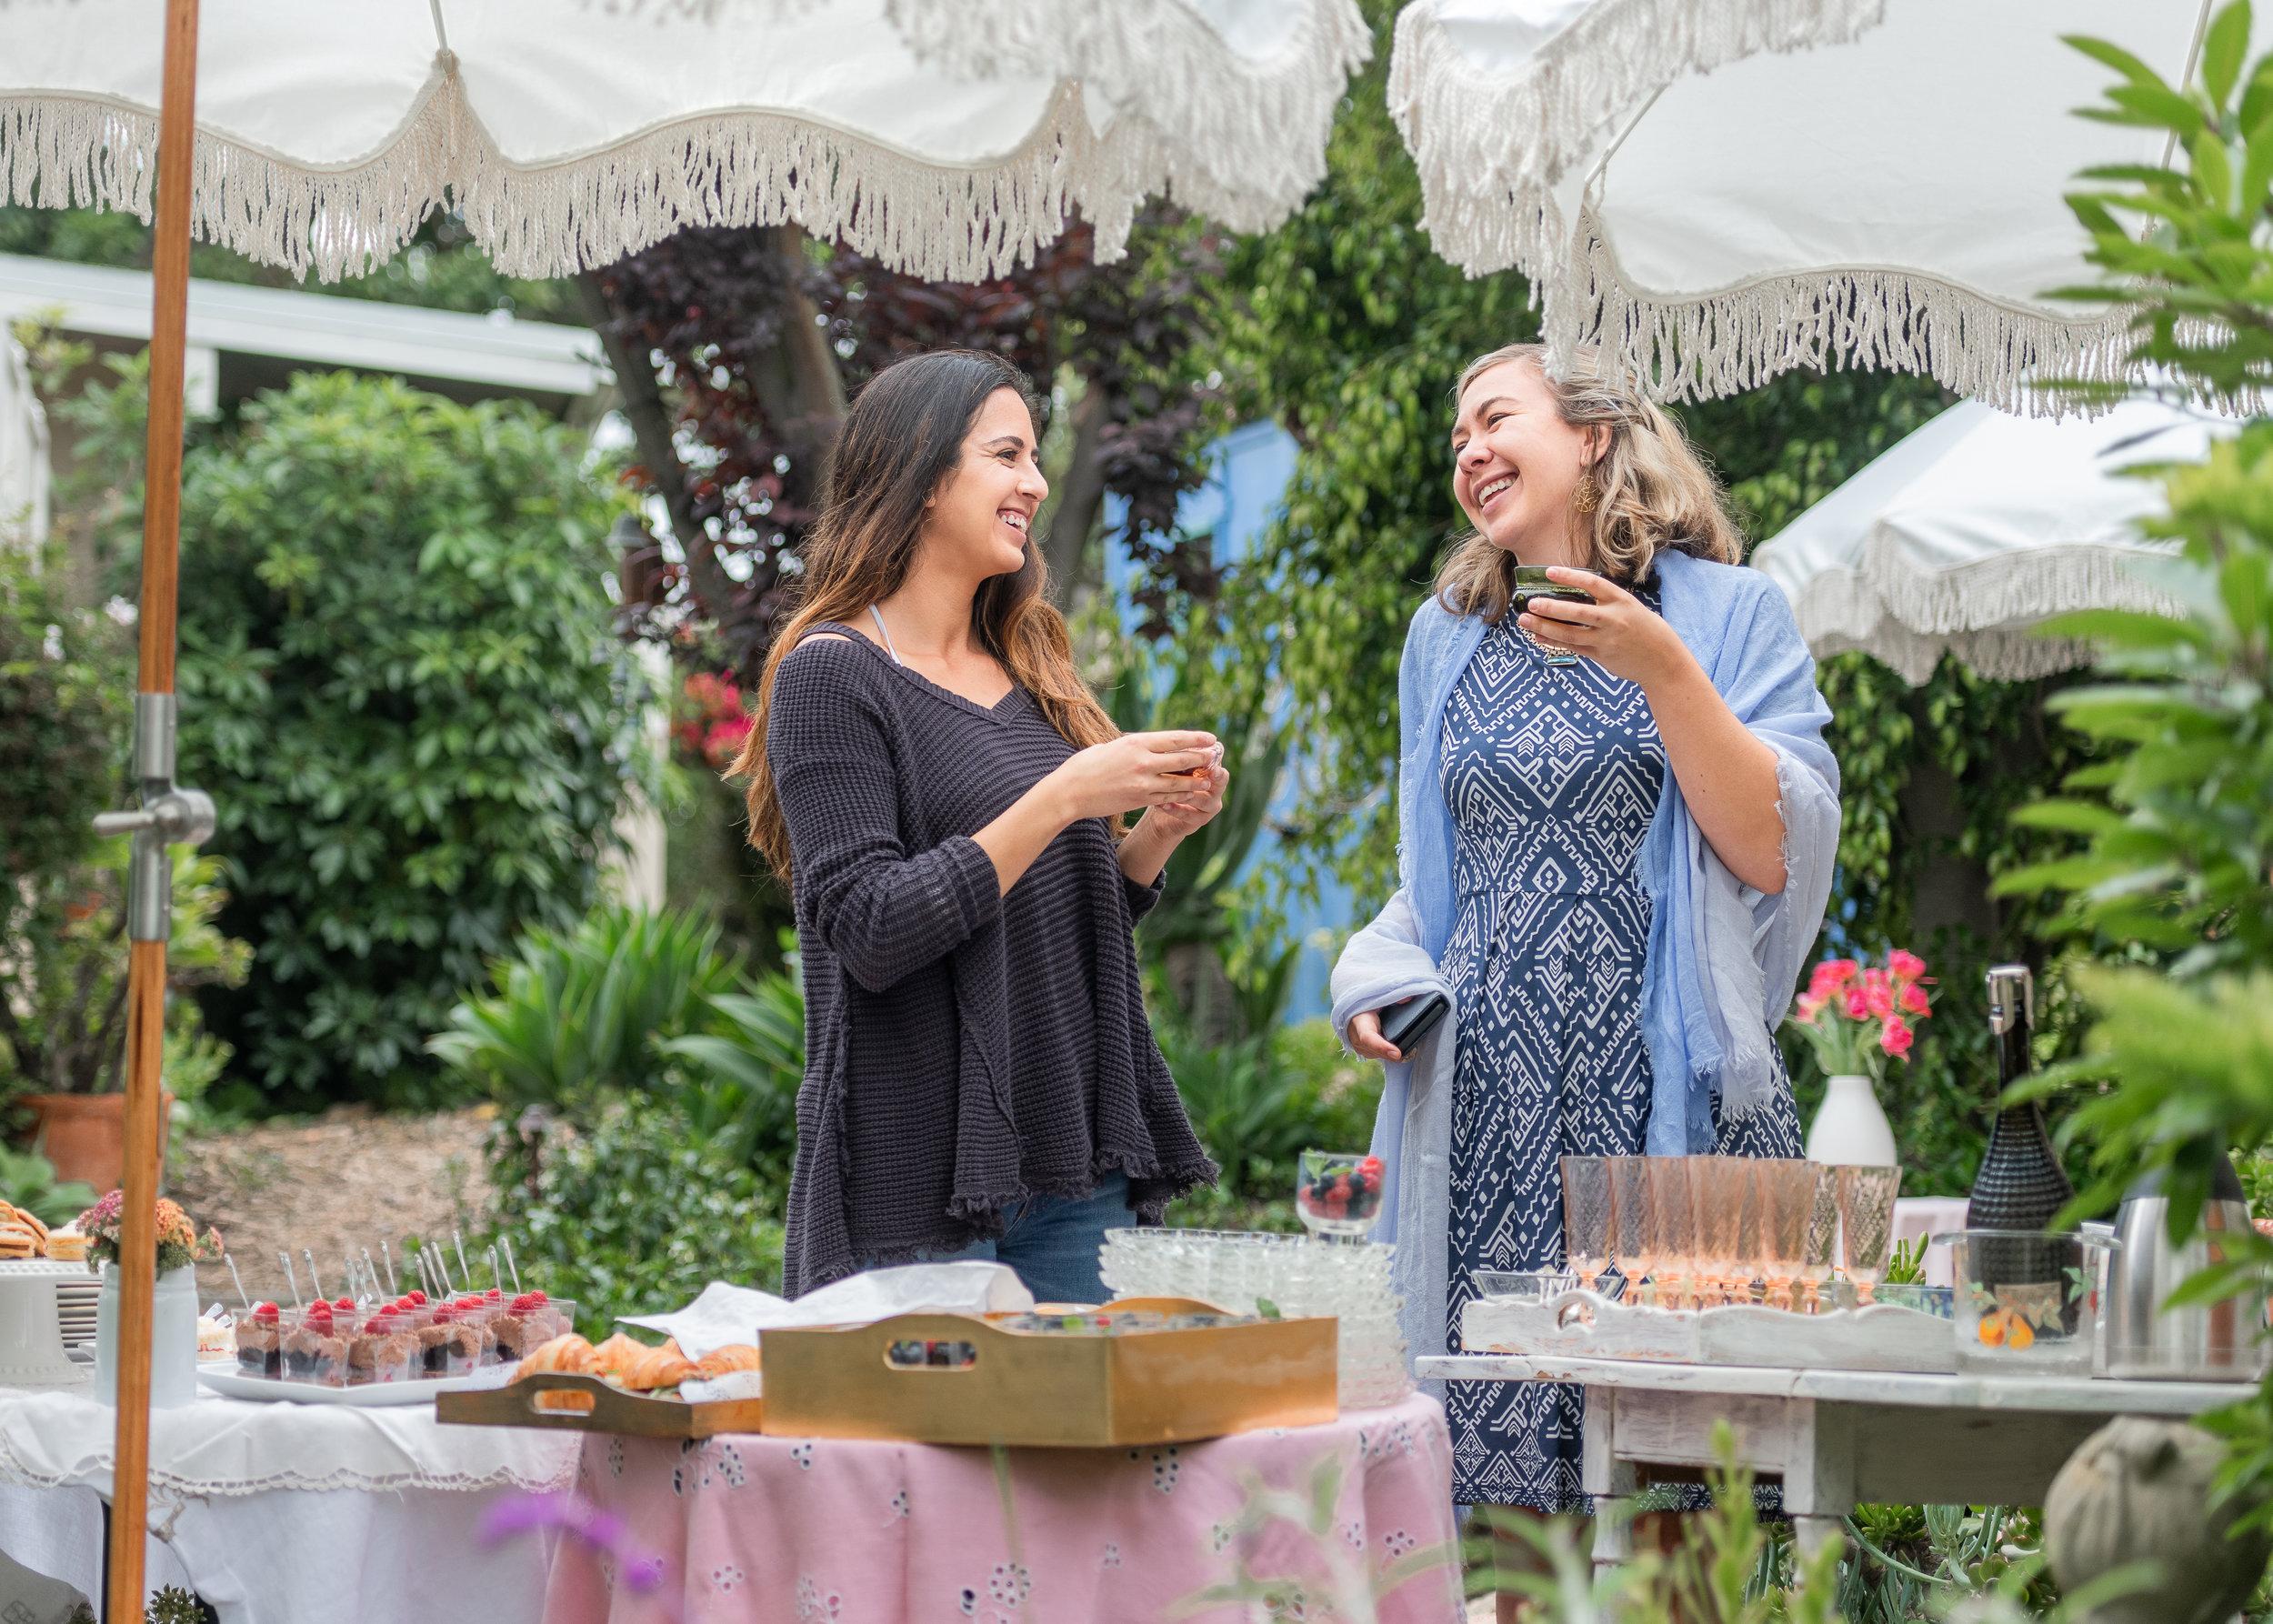 www.santabarbarawedding.com | Willa Kveta Photography | Santa Barbara Classic Weddings | Officiant Event